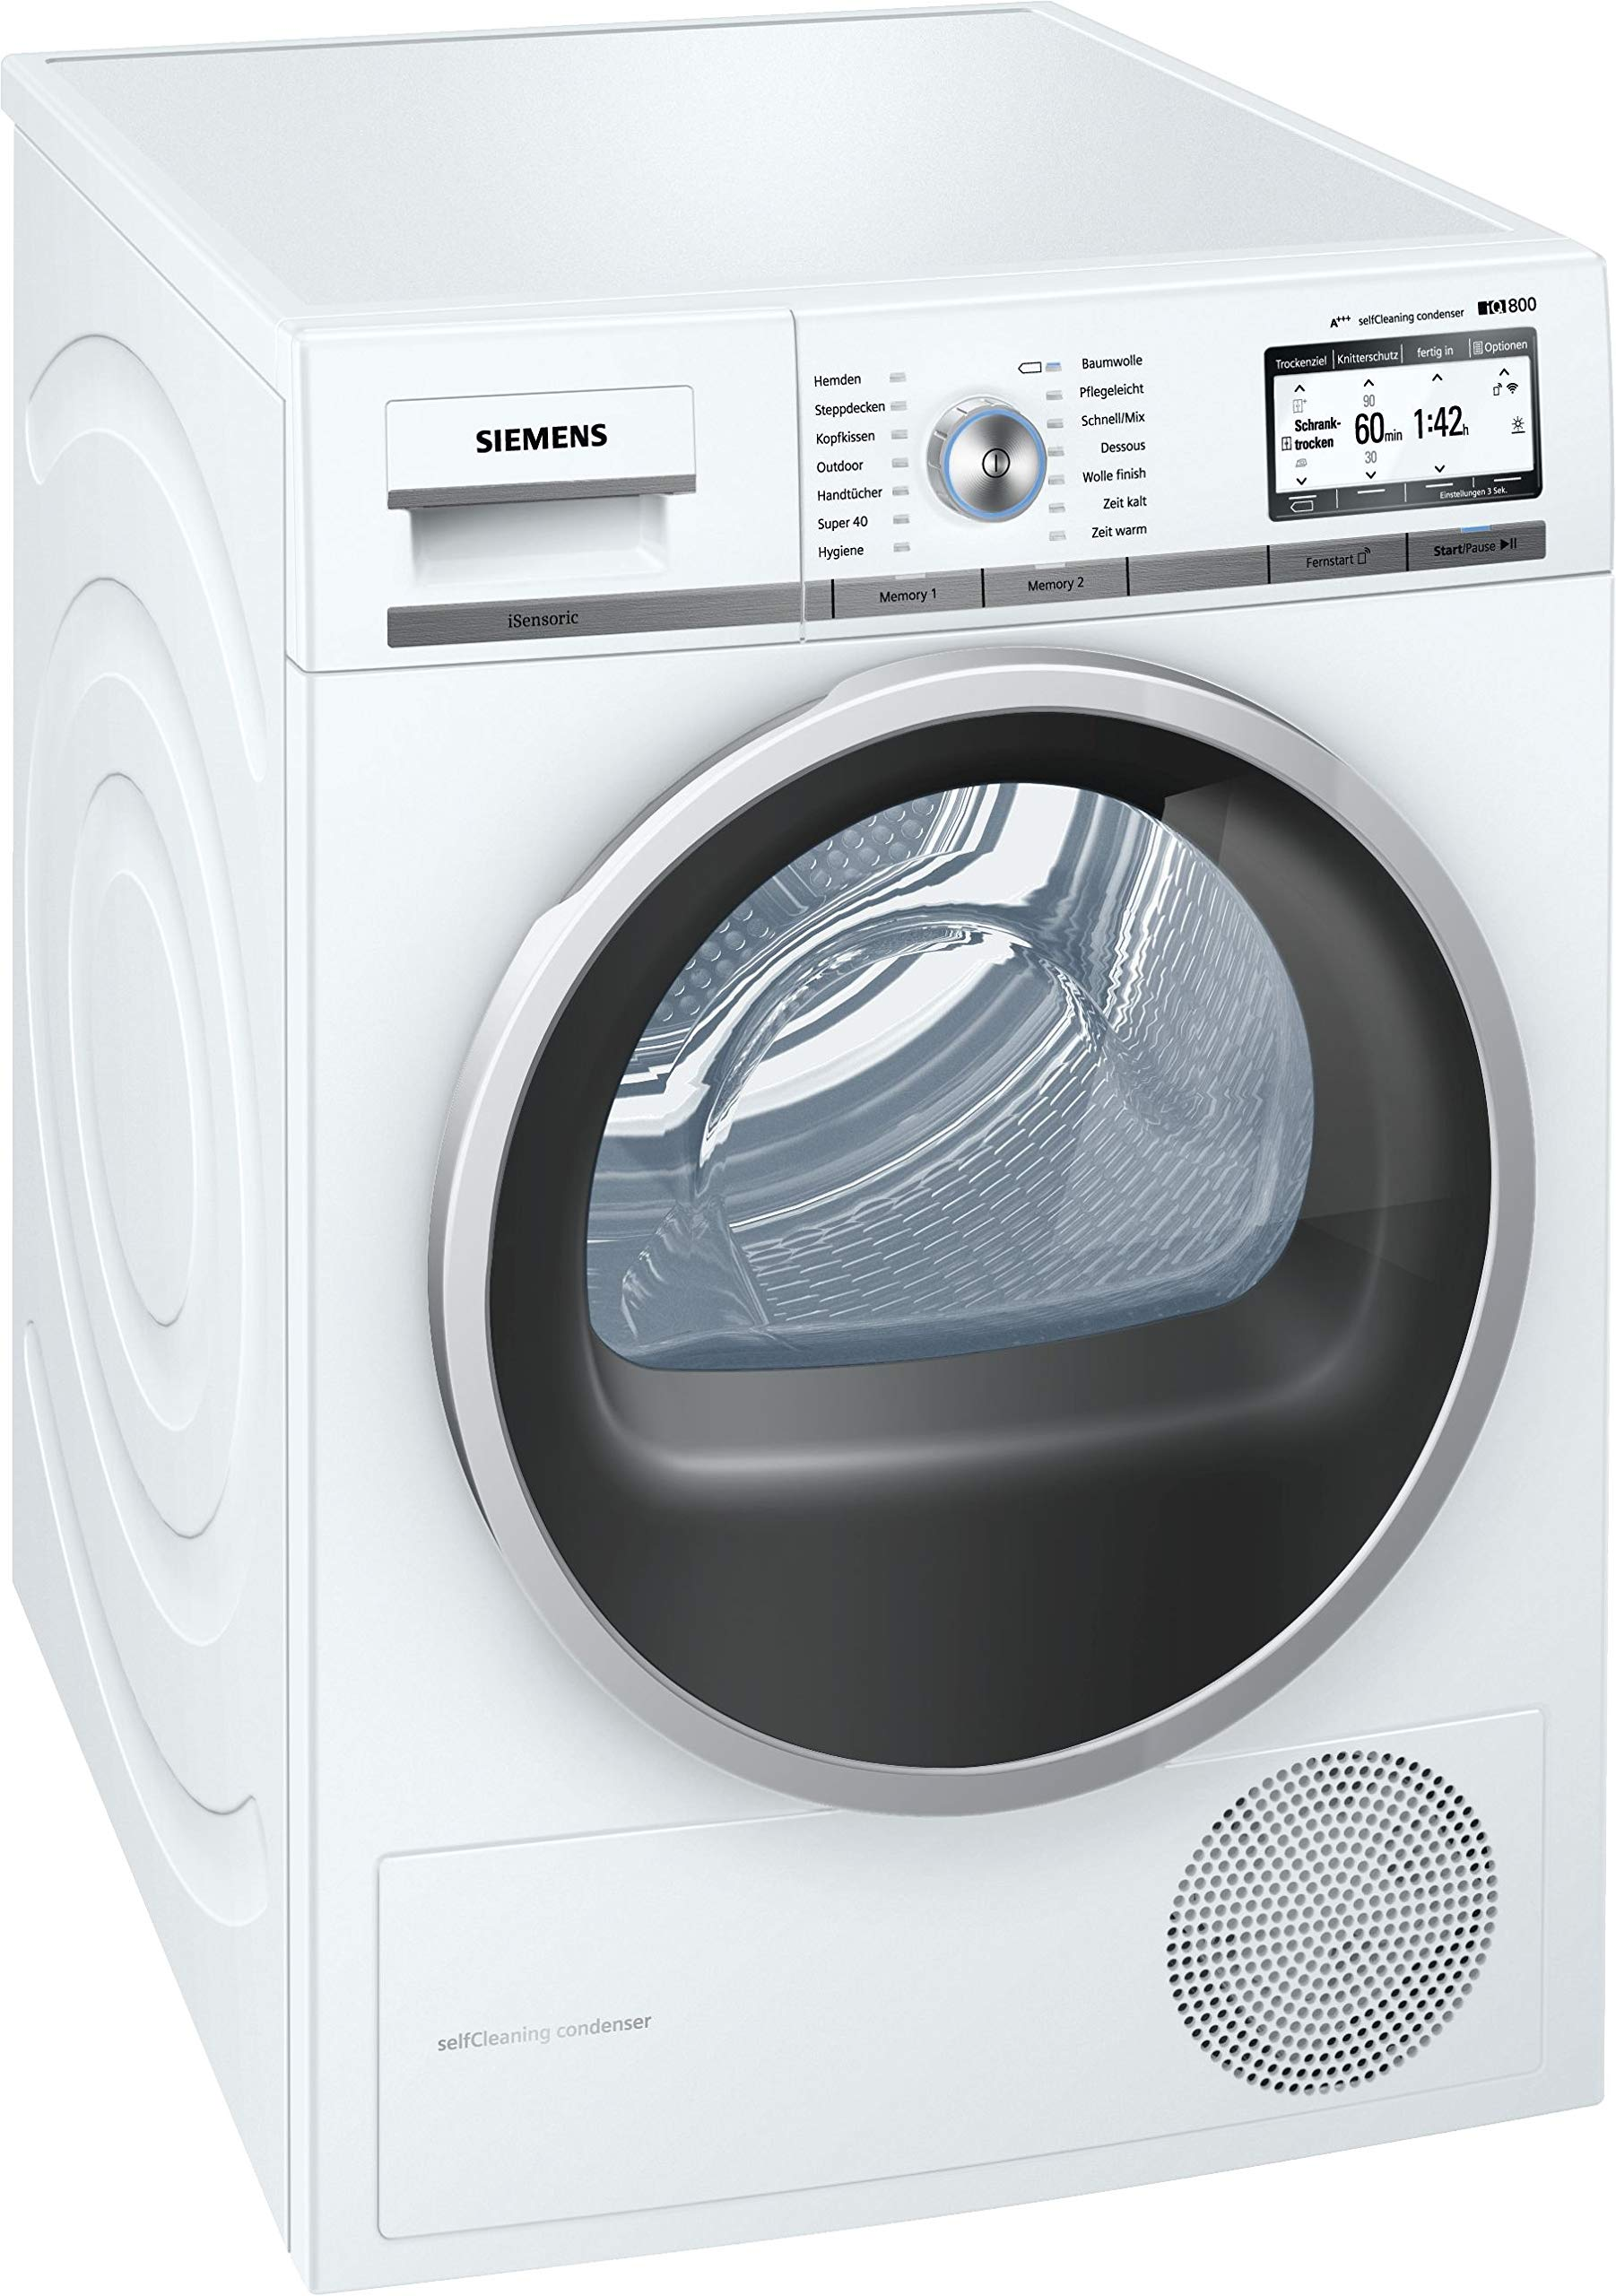 Siemens WT7YH701 iQ800 Home Connect Wärmepumpentrockner, 8 kg, weiß